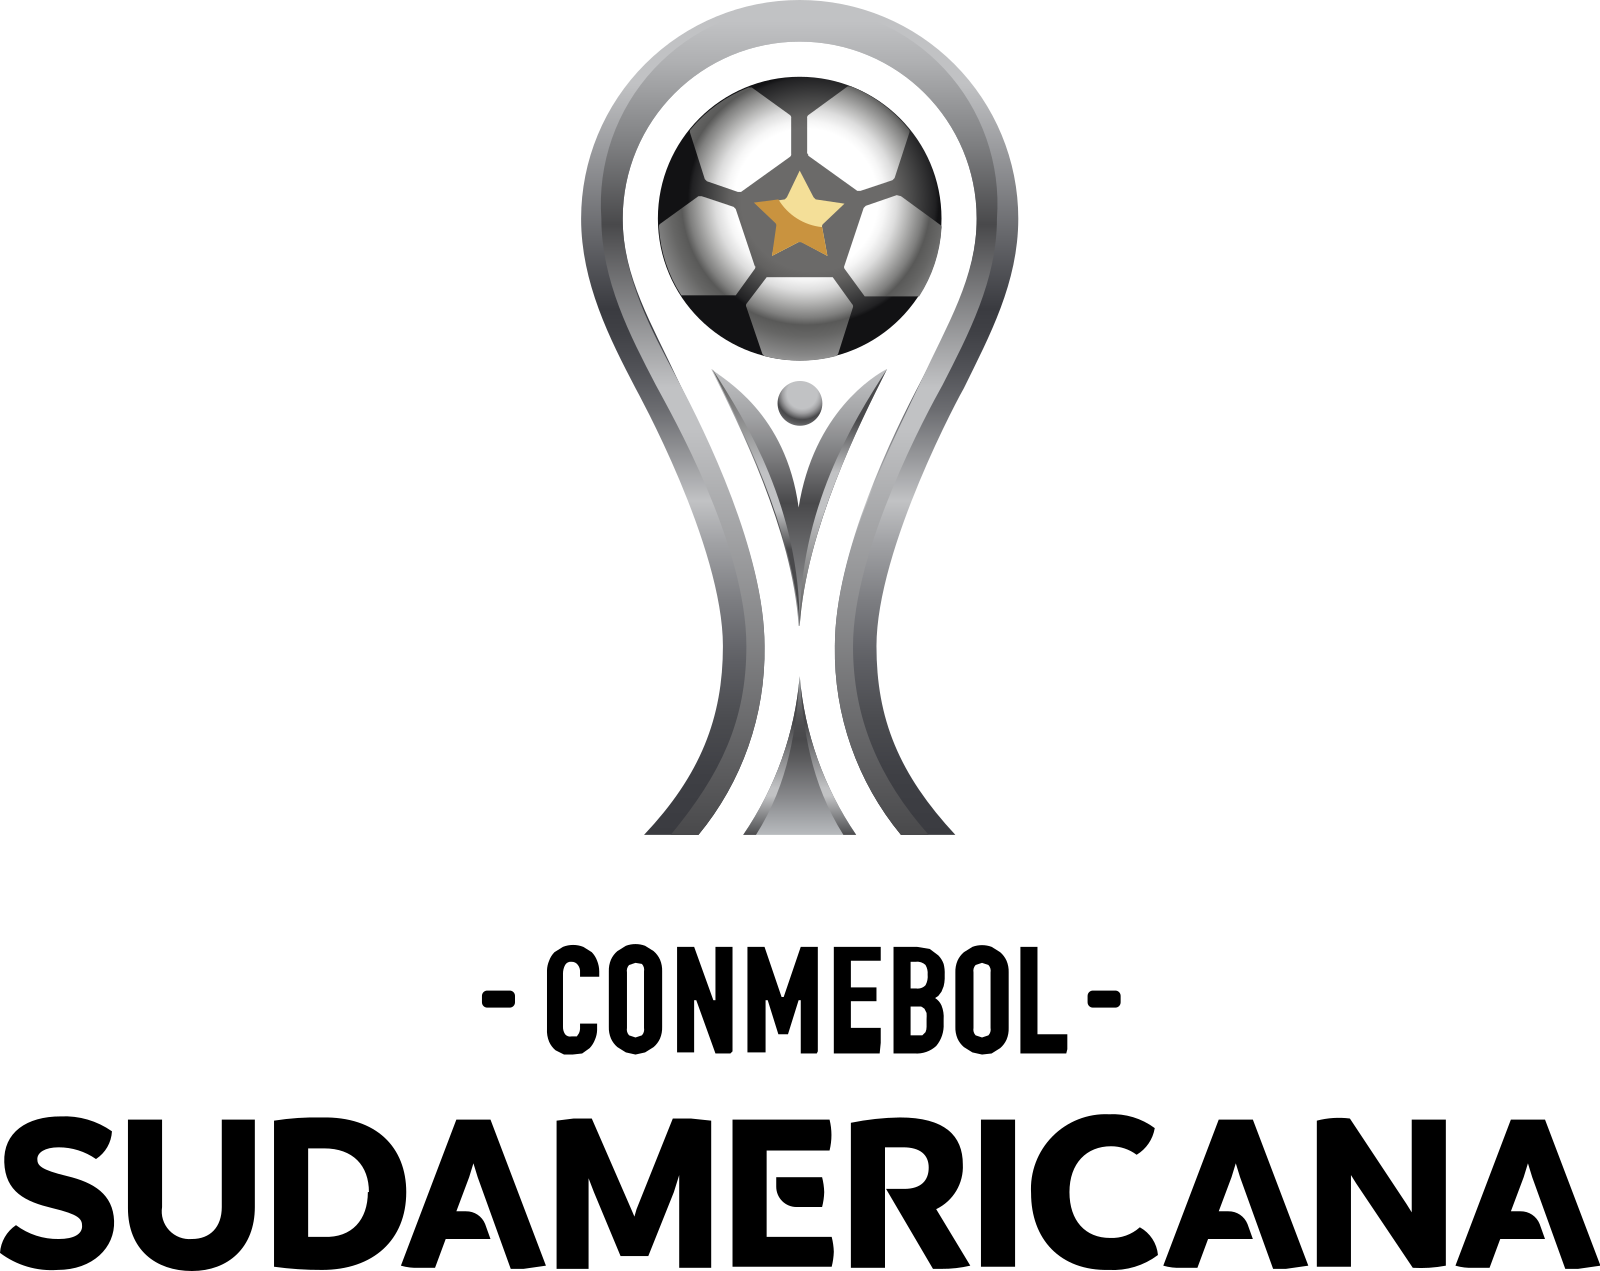 copa sulamericana logo 2 - Copa Sudamericana Logo